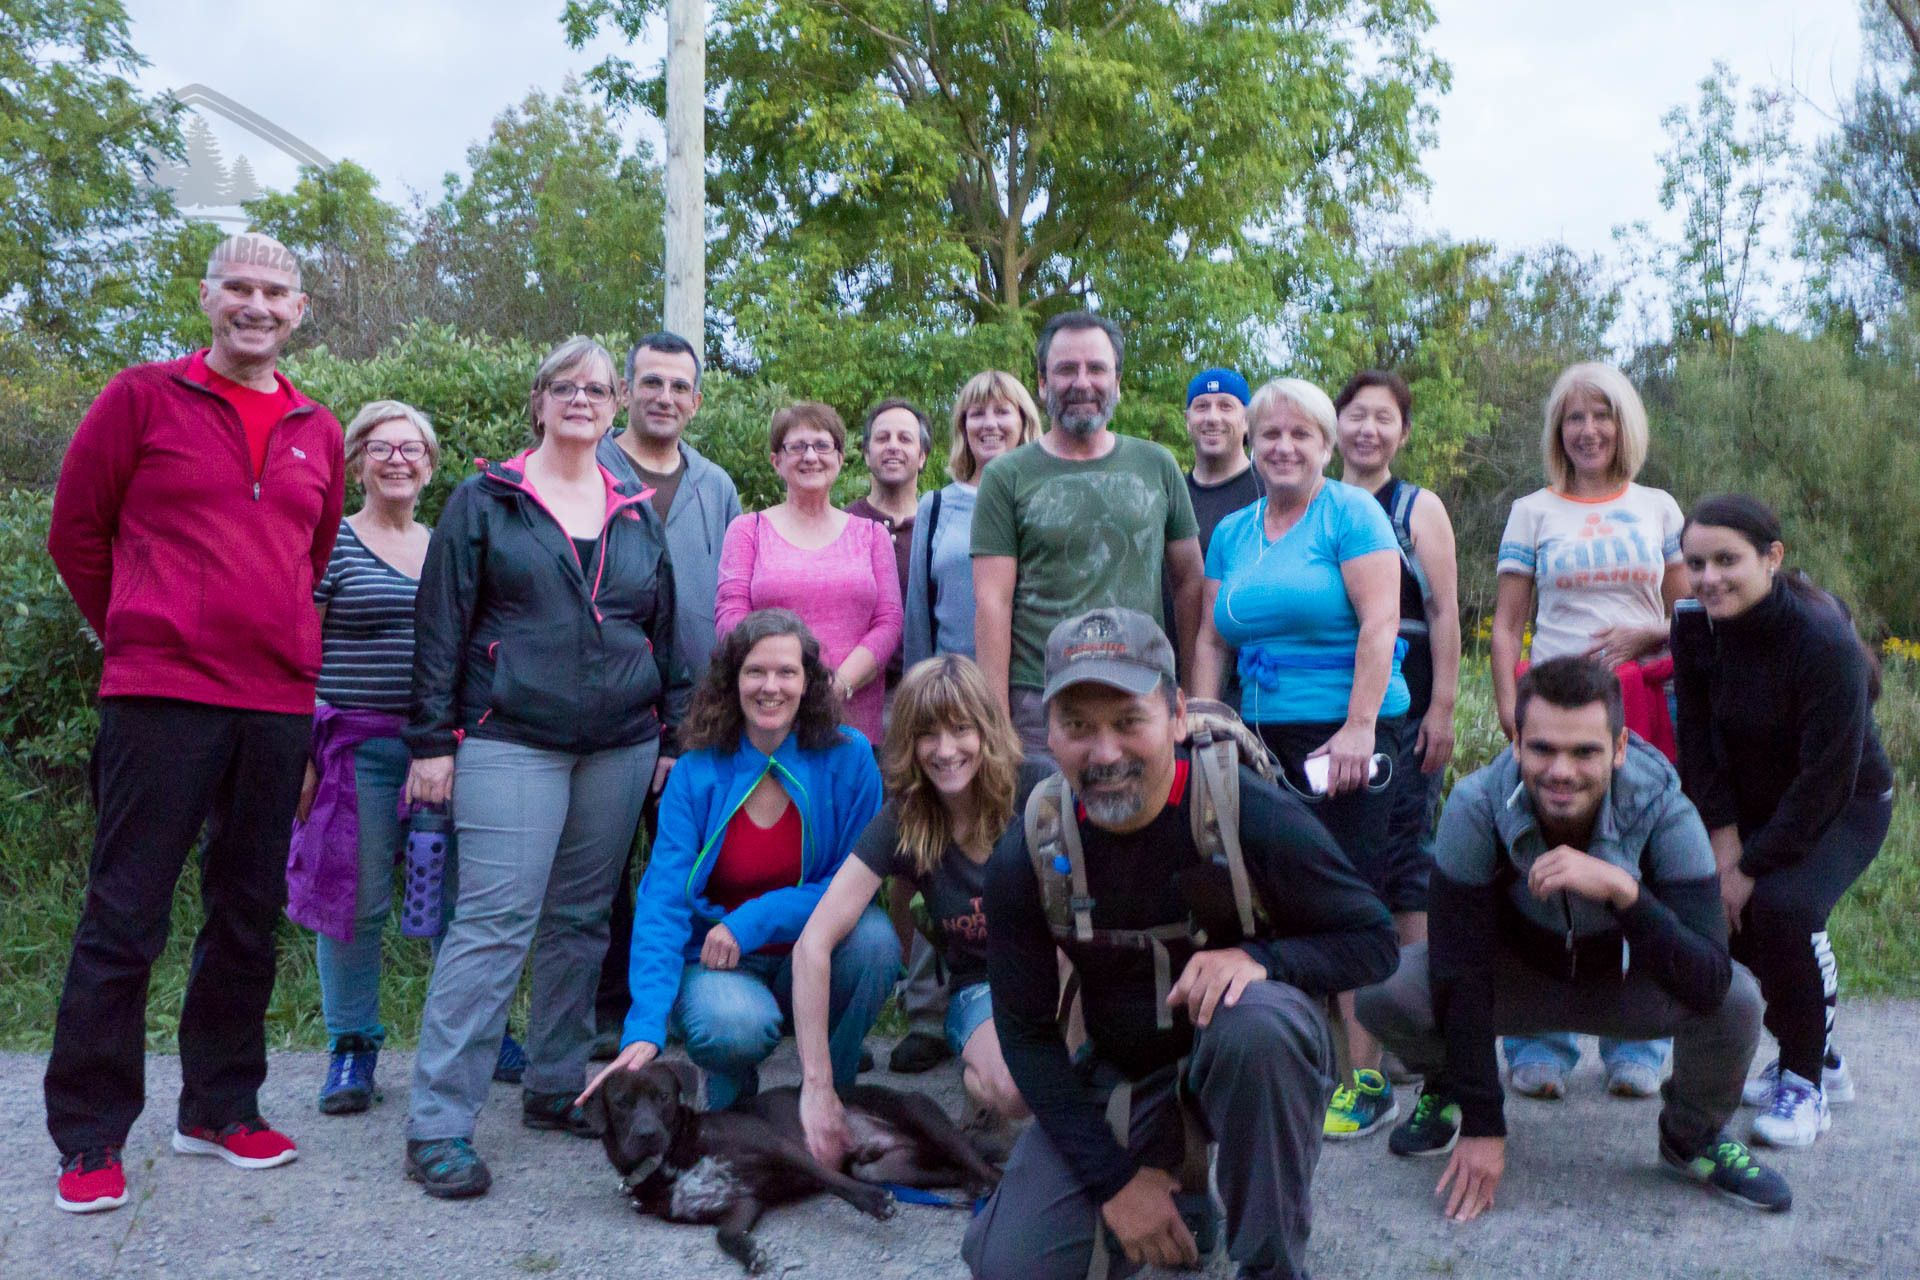 Hamilton Trail Blazers (HTB) Hiking & Outdoors Group